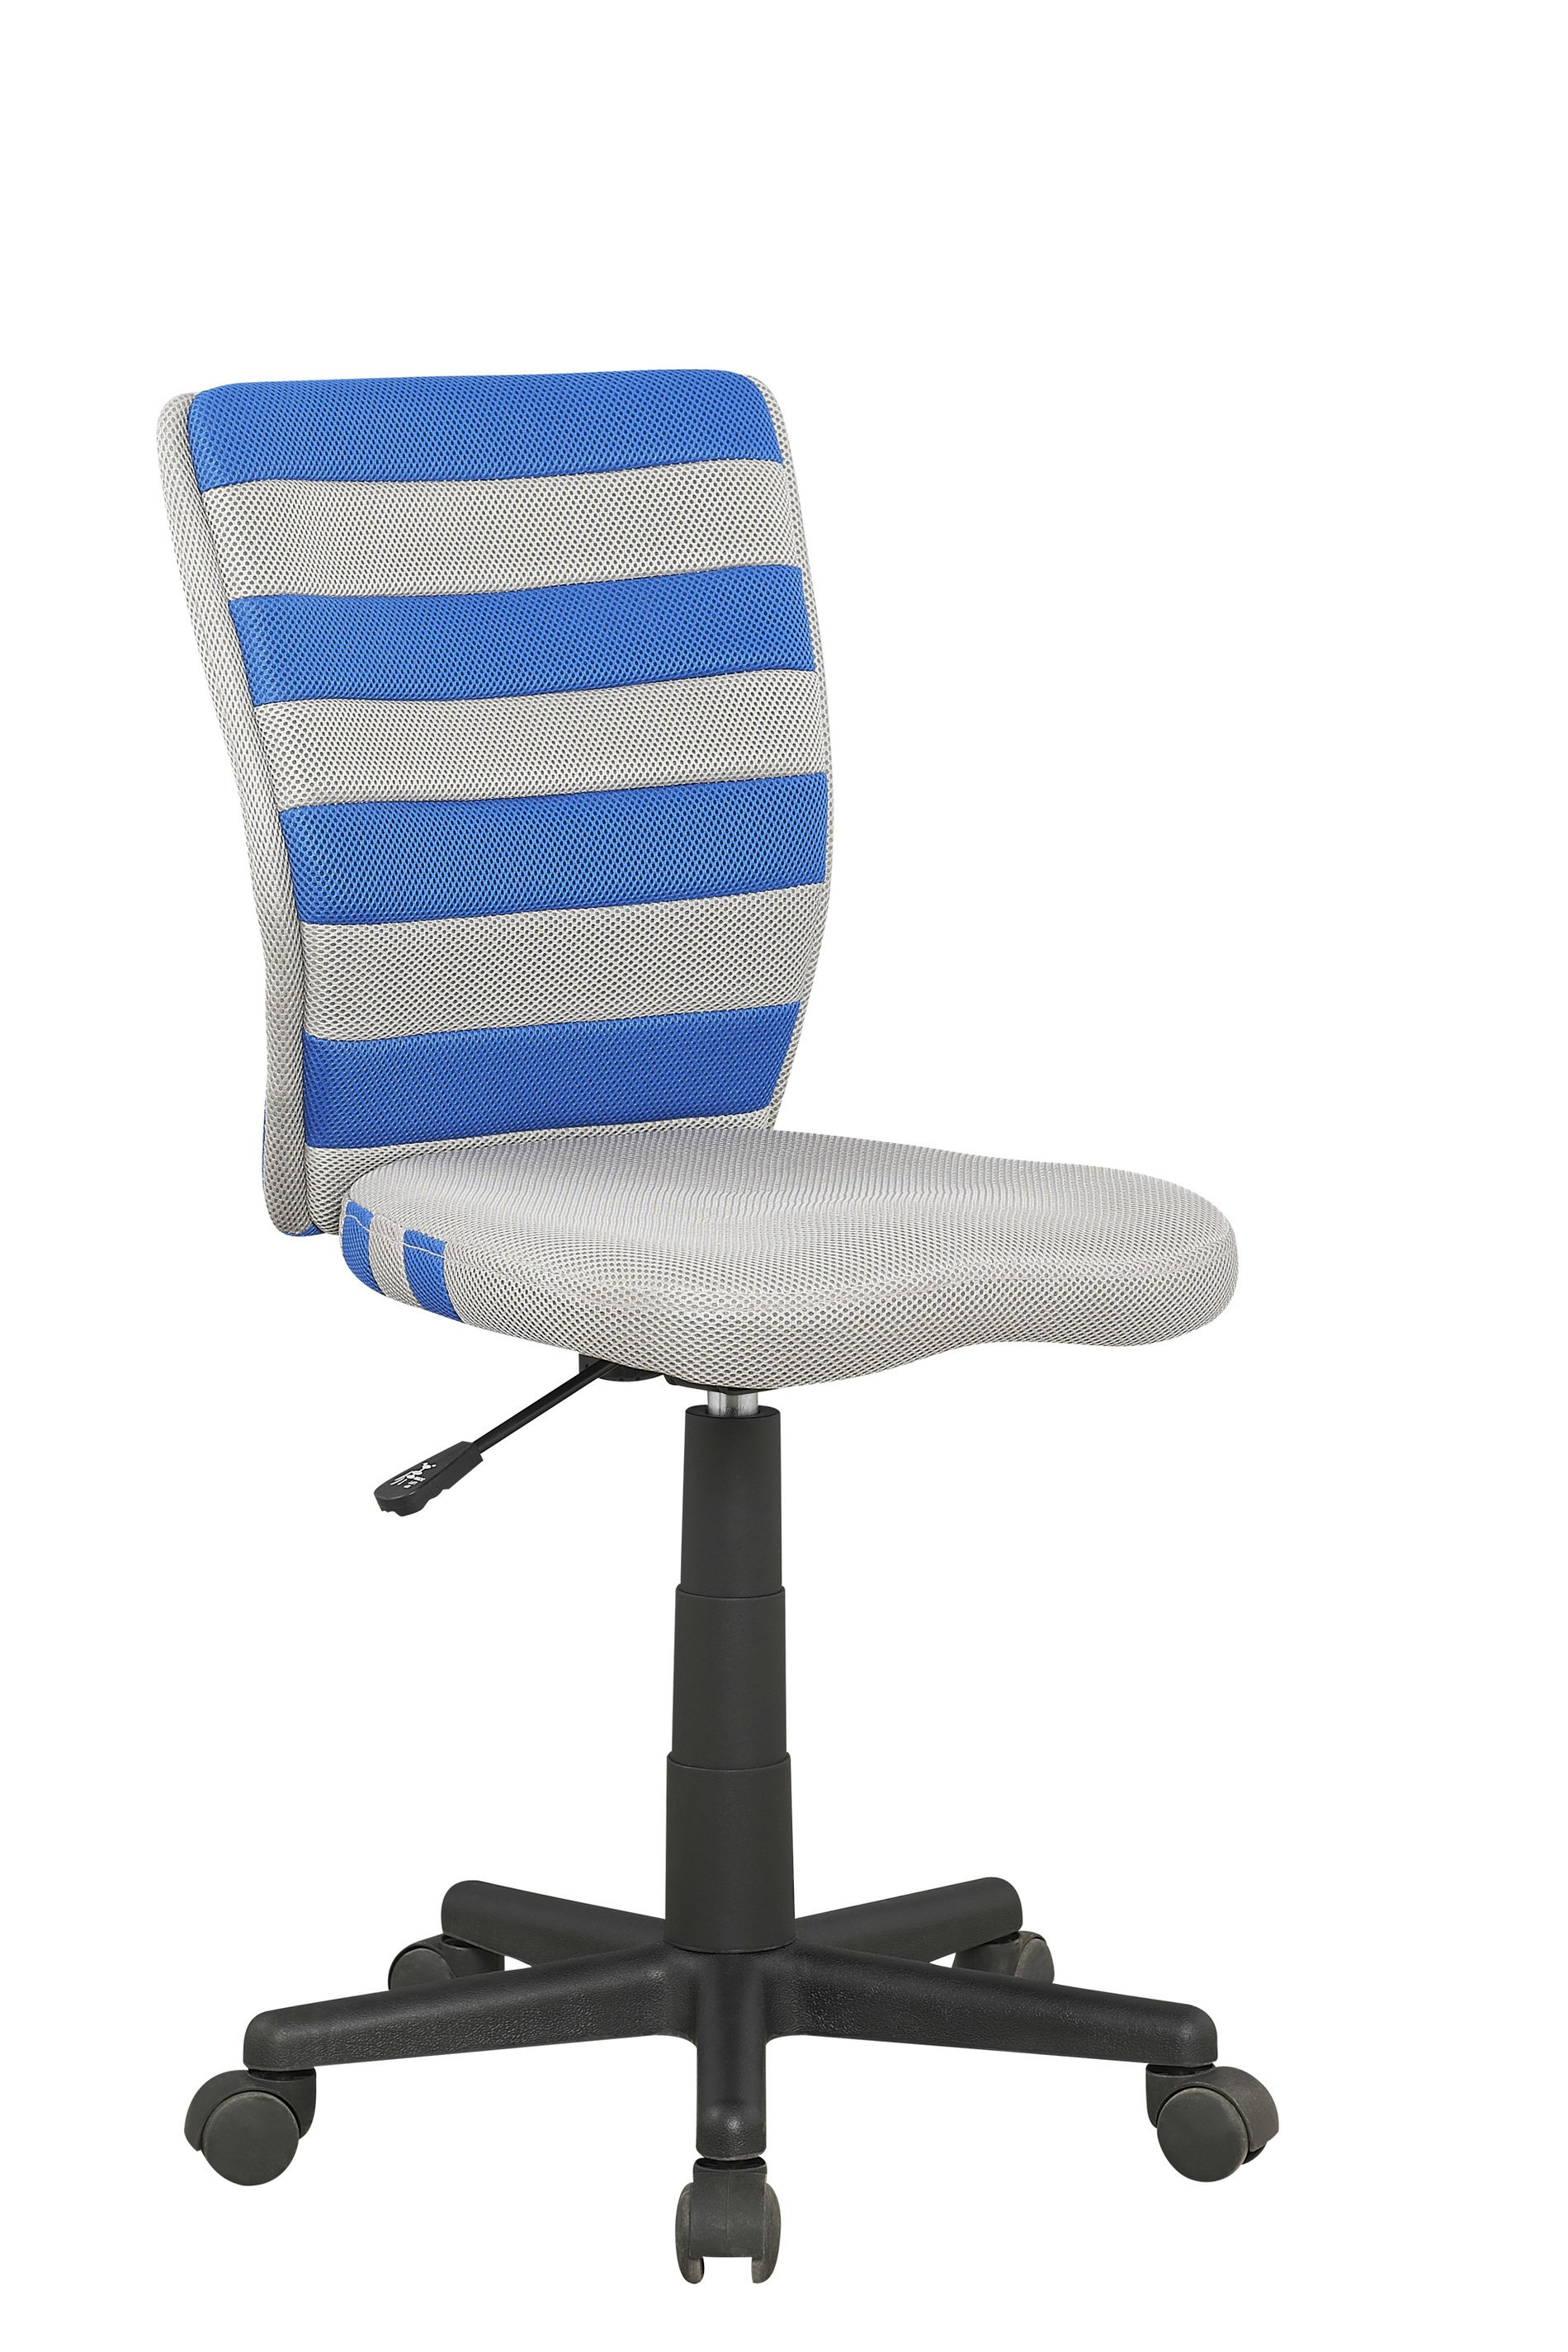 Dětská židle - Halmar - Fuego (šedá + modrá)